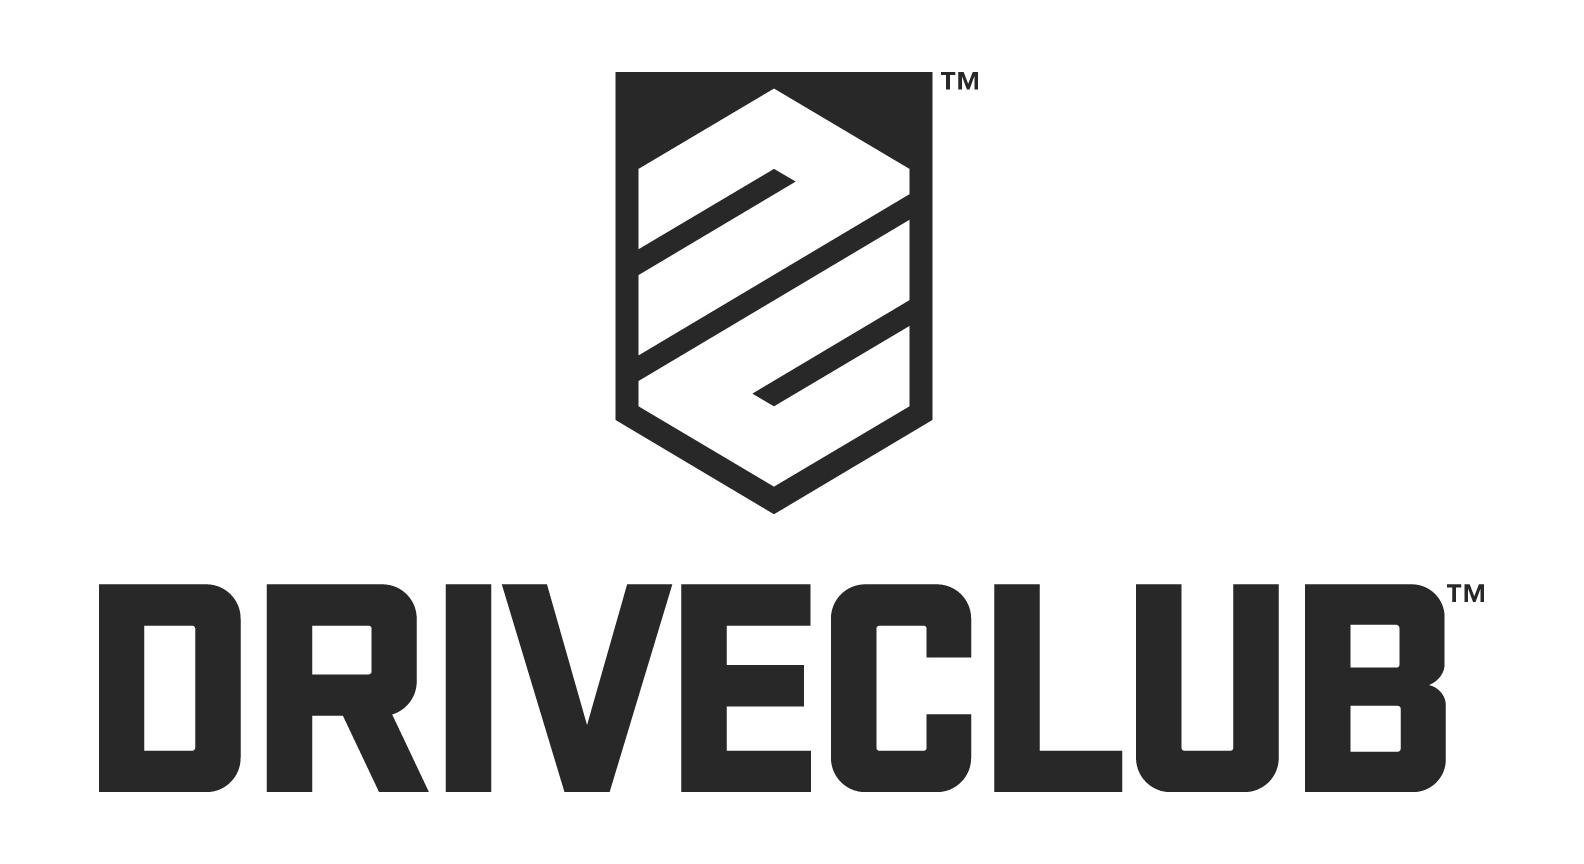 sony morpheus logo. driveclub_logo_main_grey_rgb sony morpheus logo